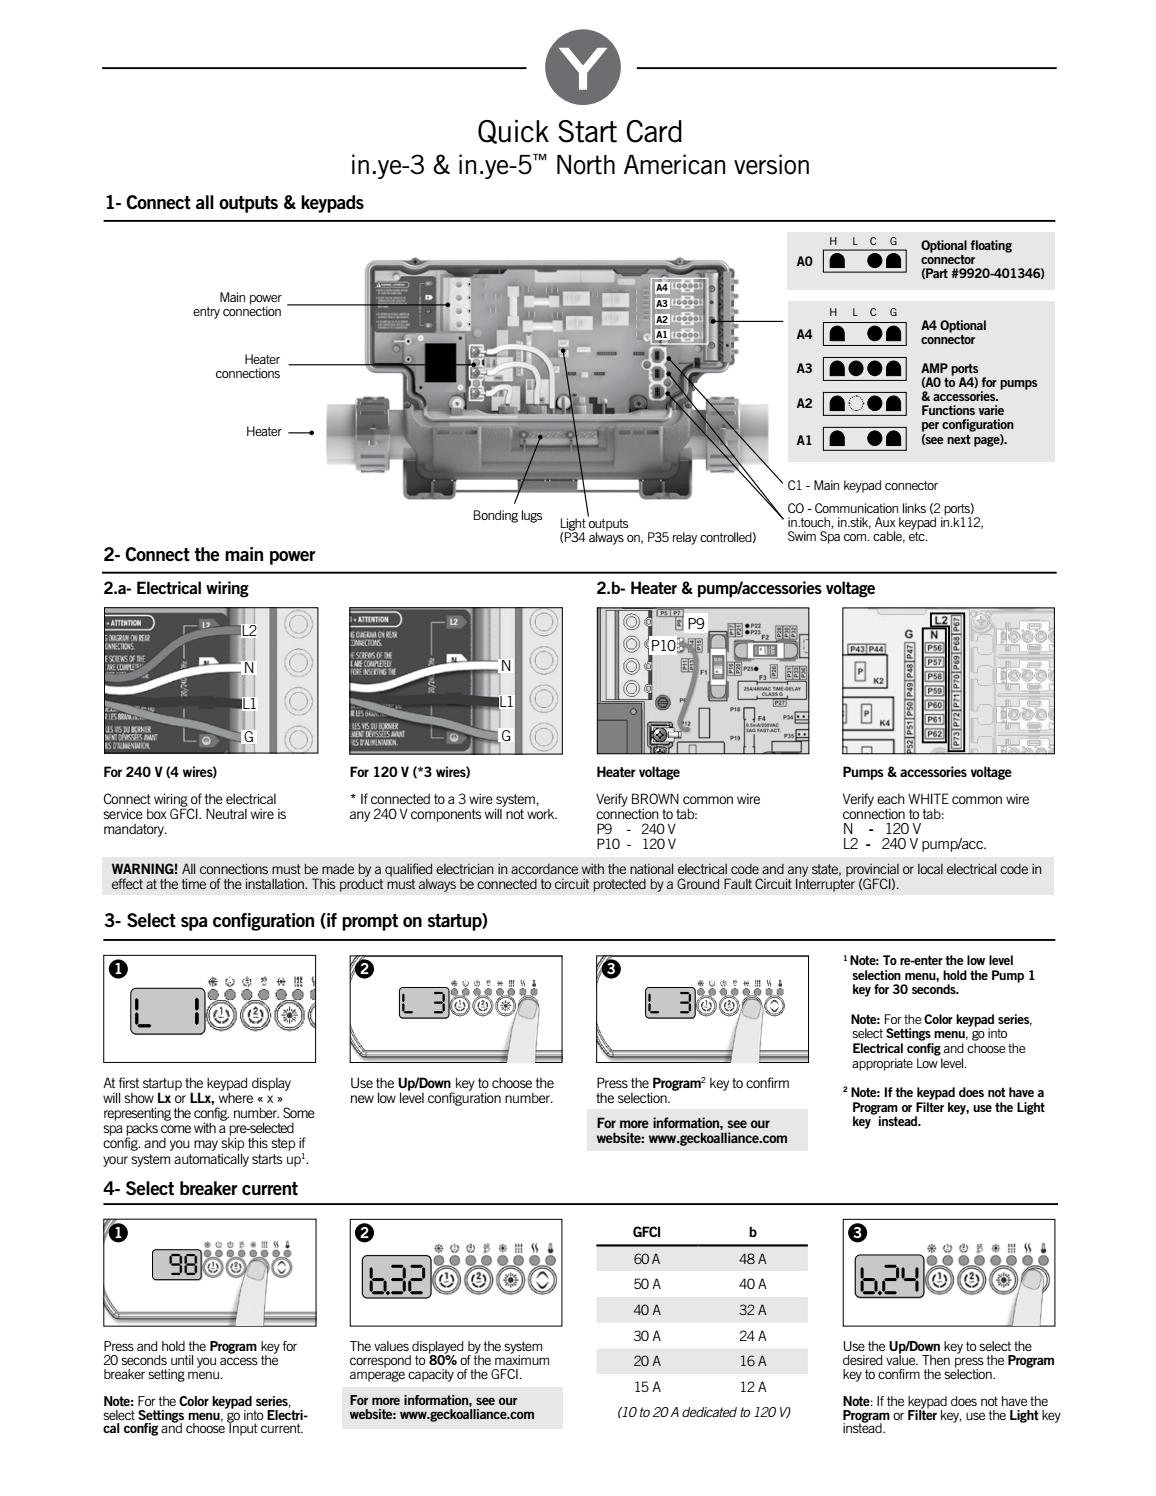 in.ye-3 & in.ye-5 control system Quick Start Card by Gecko ... on tractor key, ford key, honda key, radiator key, flywheel key, wiring diagrams for peterbilt trucks, valve key,